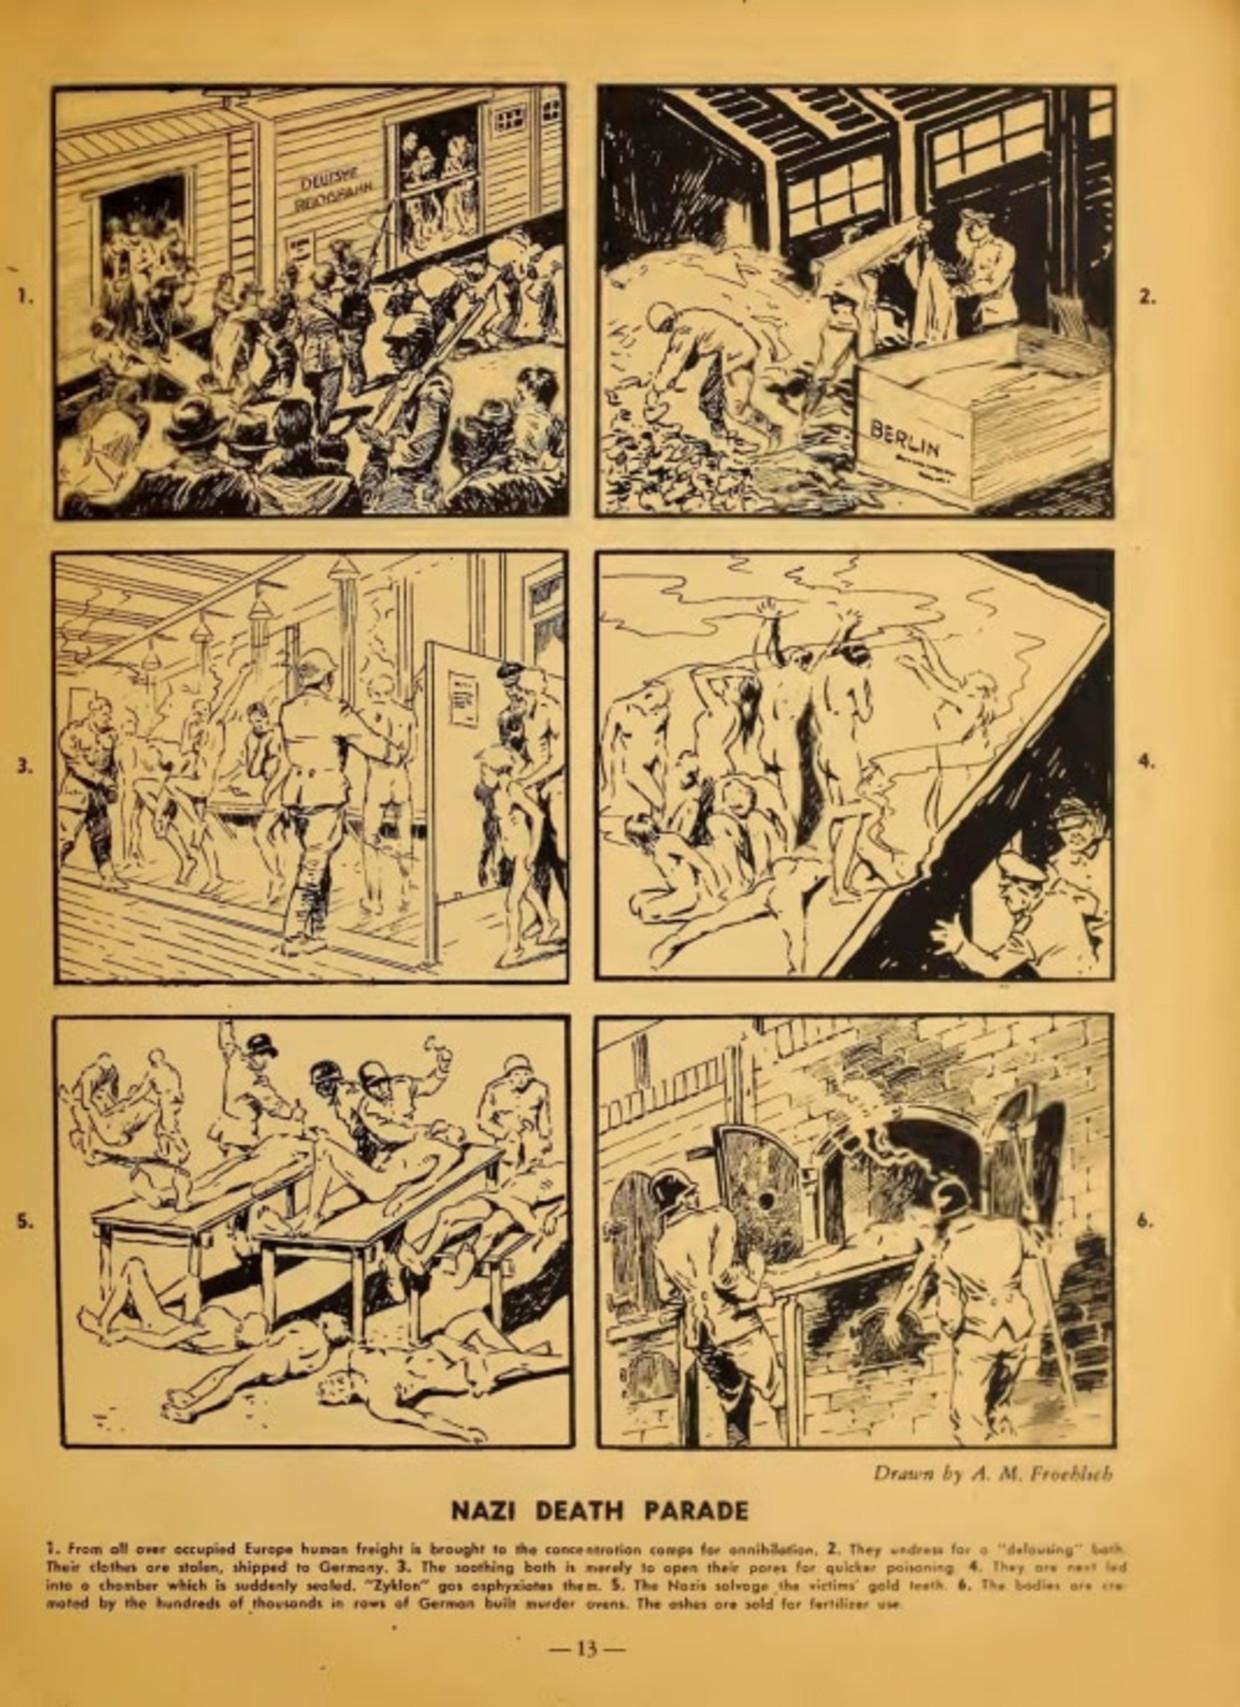 Holocaust strip uit 1944 van August M. Froehlich. Beeld